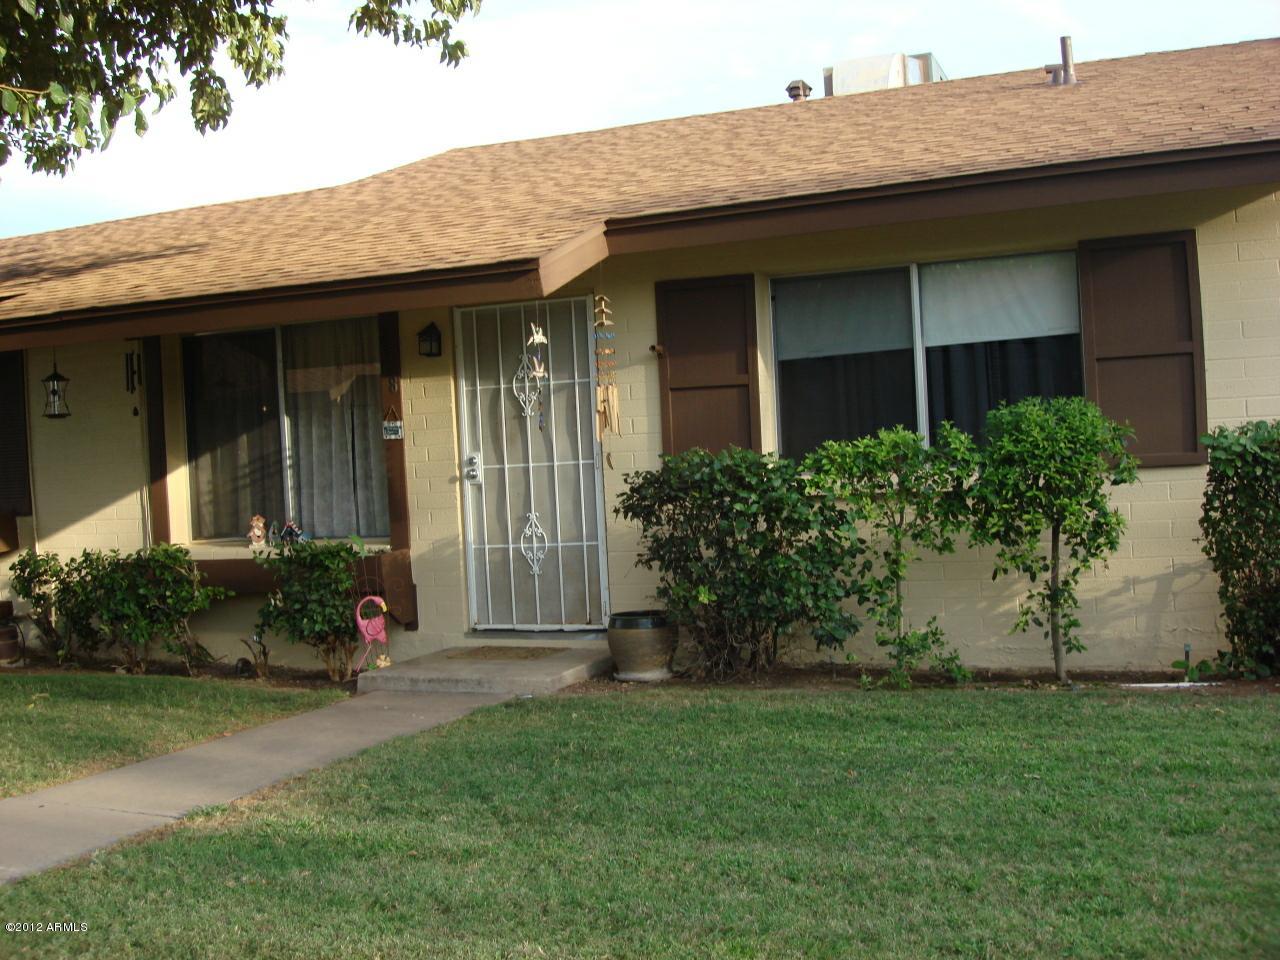 2528 N 22nd Avenue, Phoenix, AZ 85009 (MLS #4787614) :: The Daniel Montez Real Estate Group